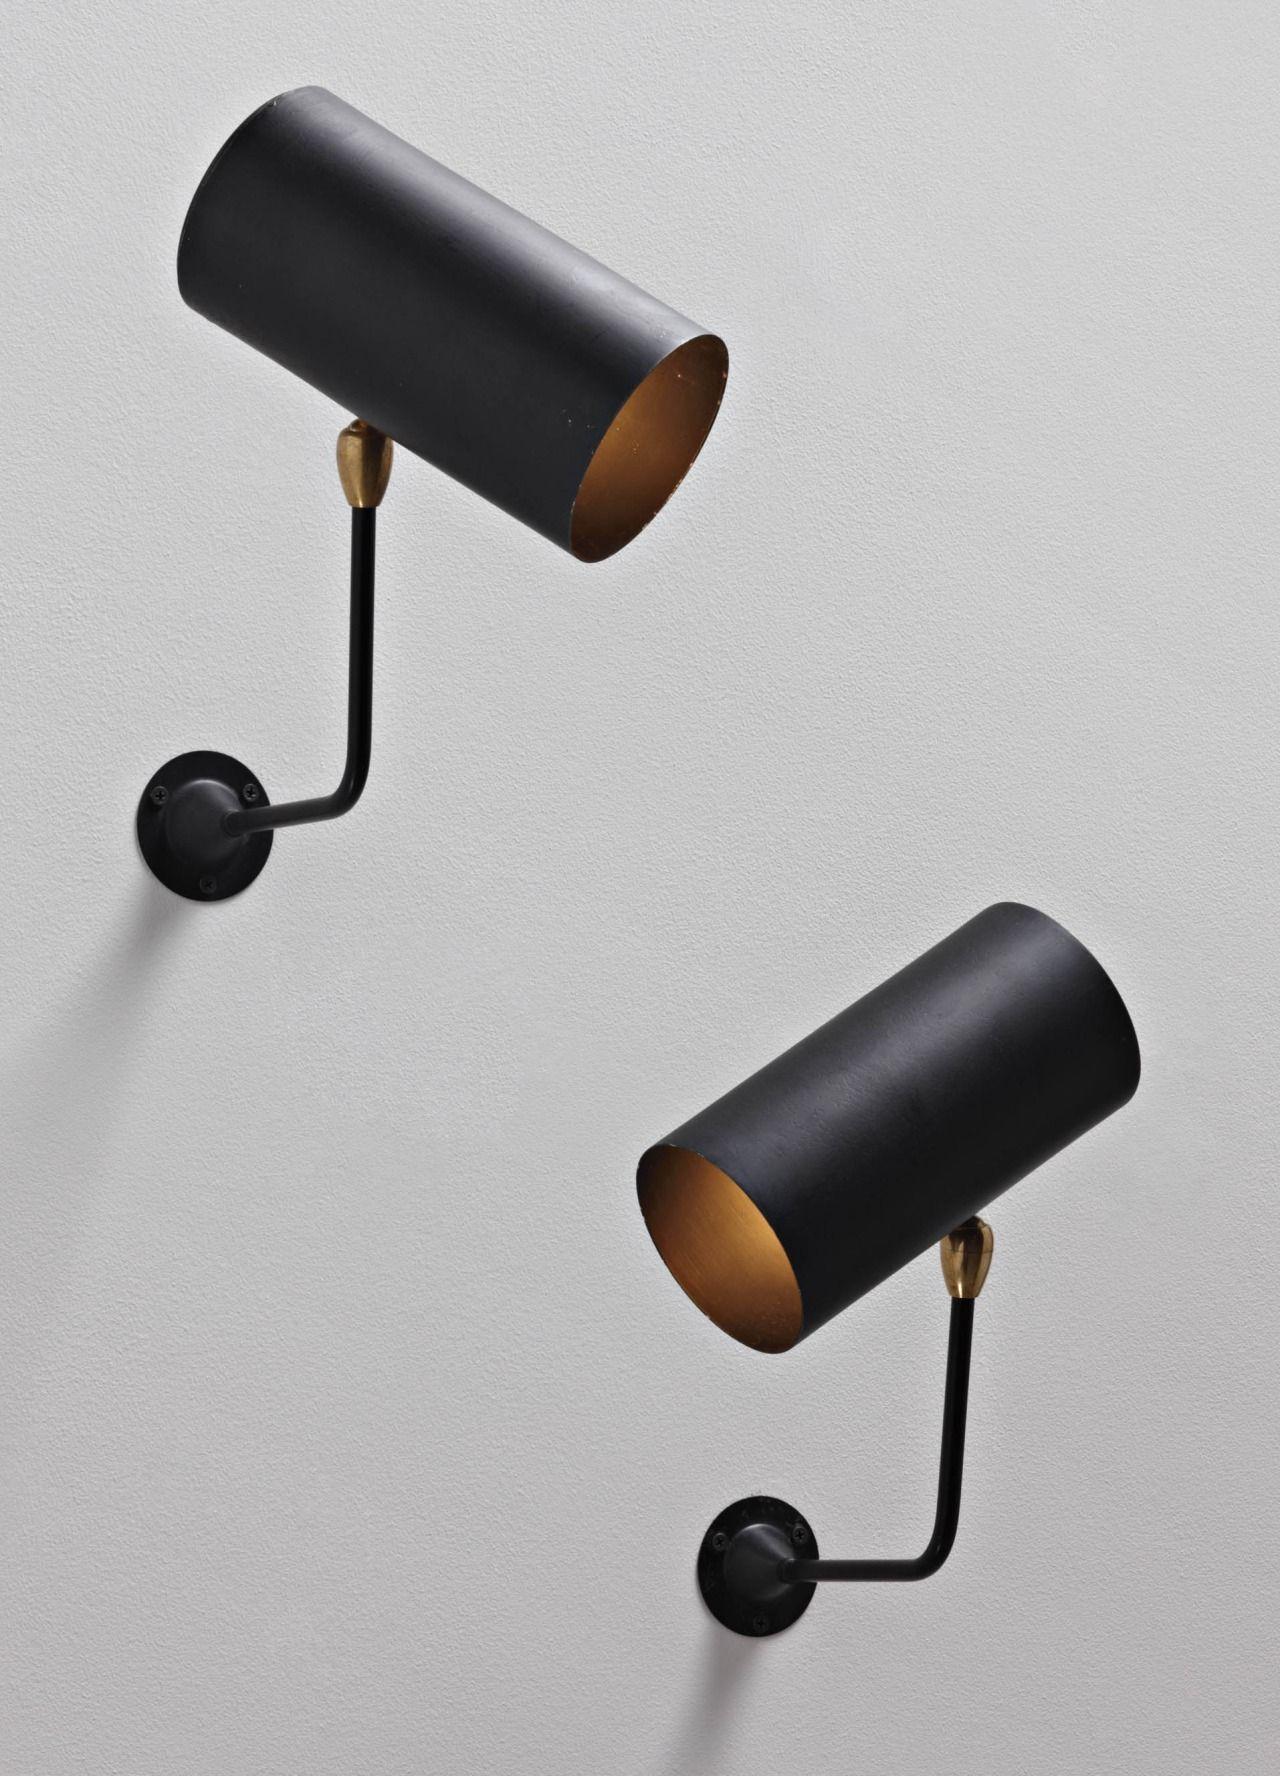 Serge Mouille Tuyaux Wall Lightss For Atelier Serge Mouille C